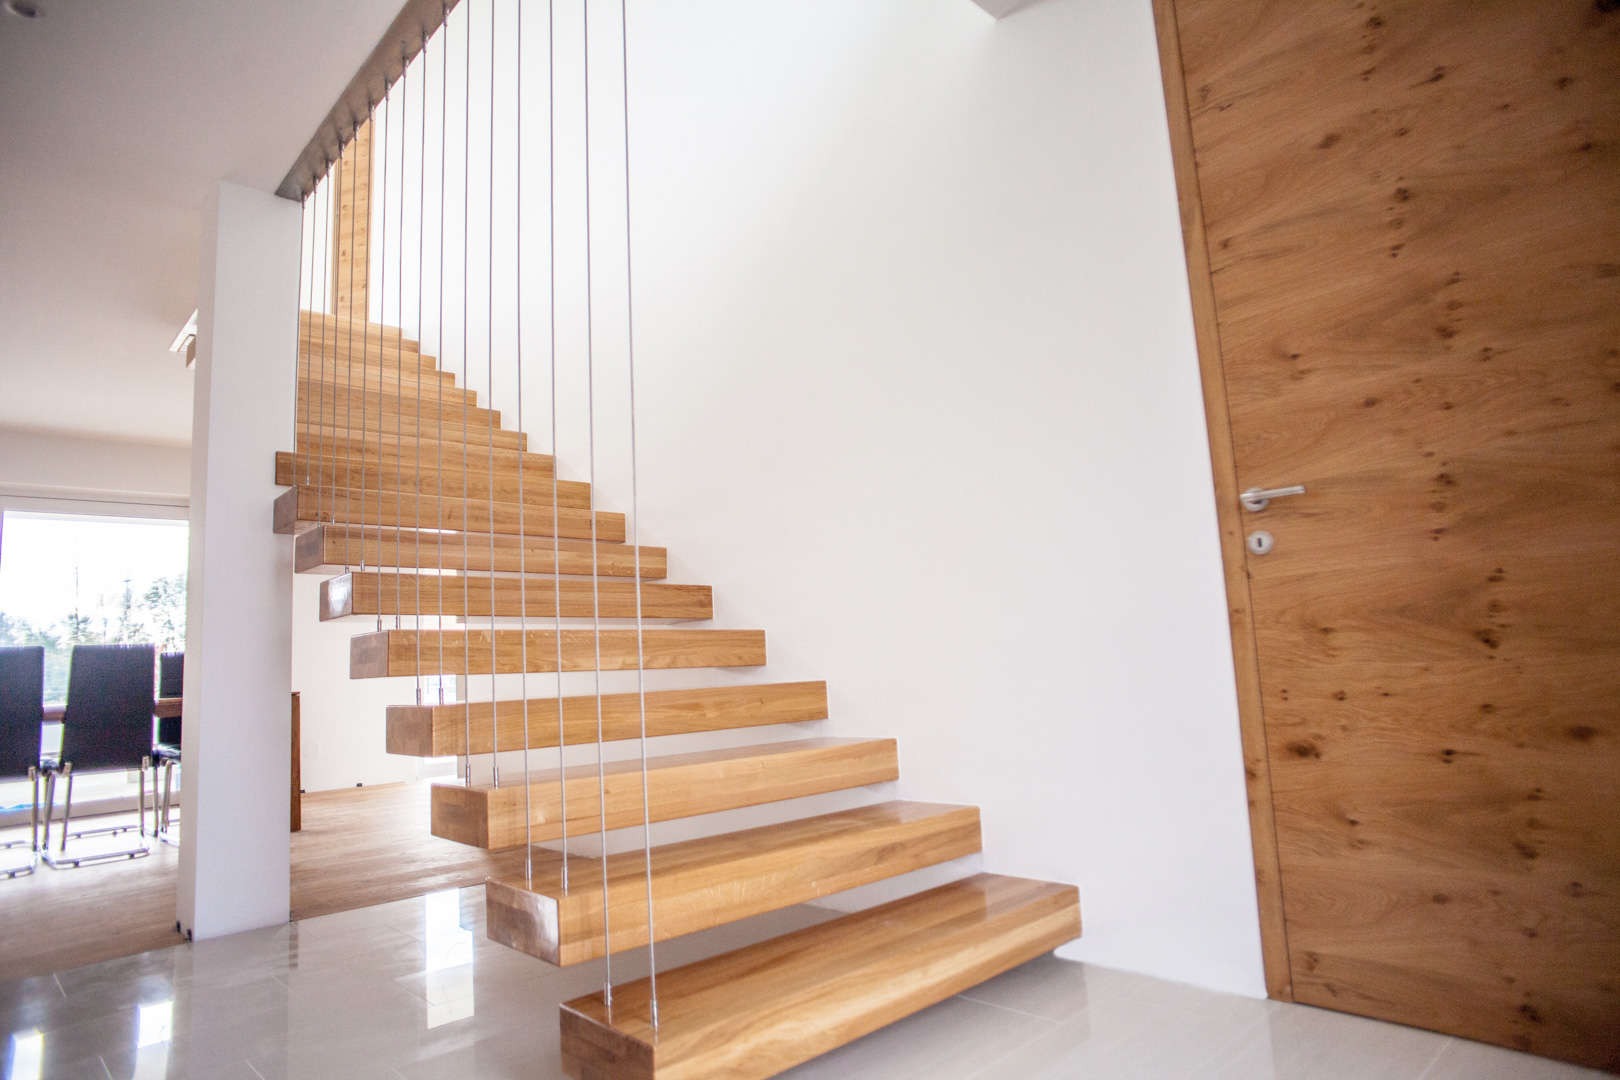 metallia treppe treppengel nder metallia. Black Bedroom Furniture Sets. Home Design Ideas